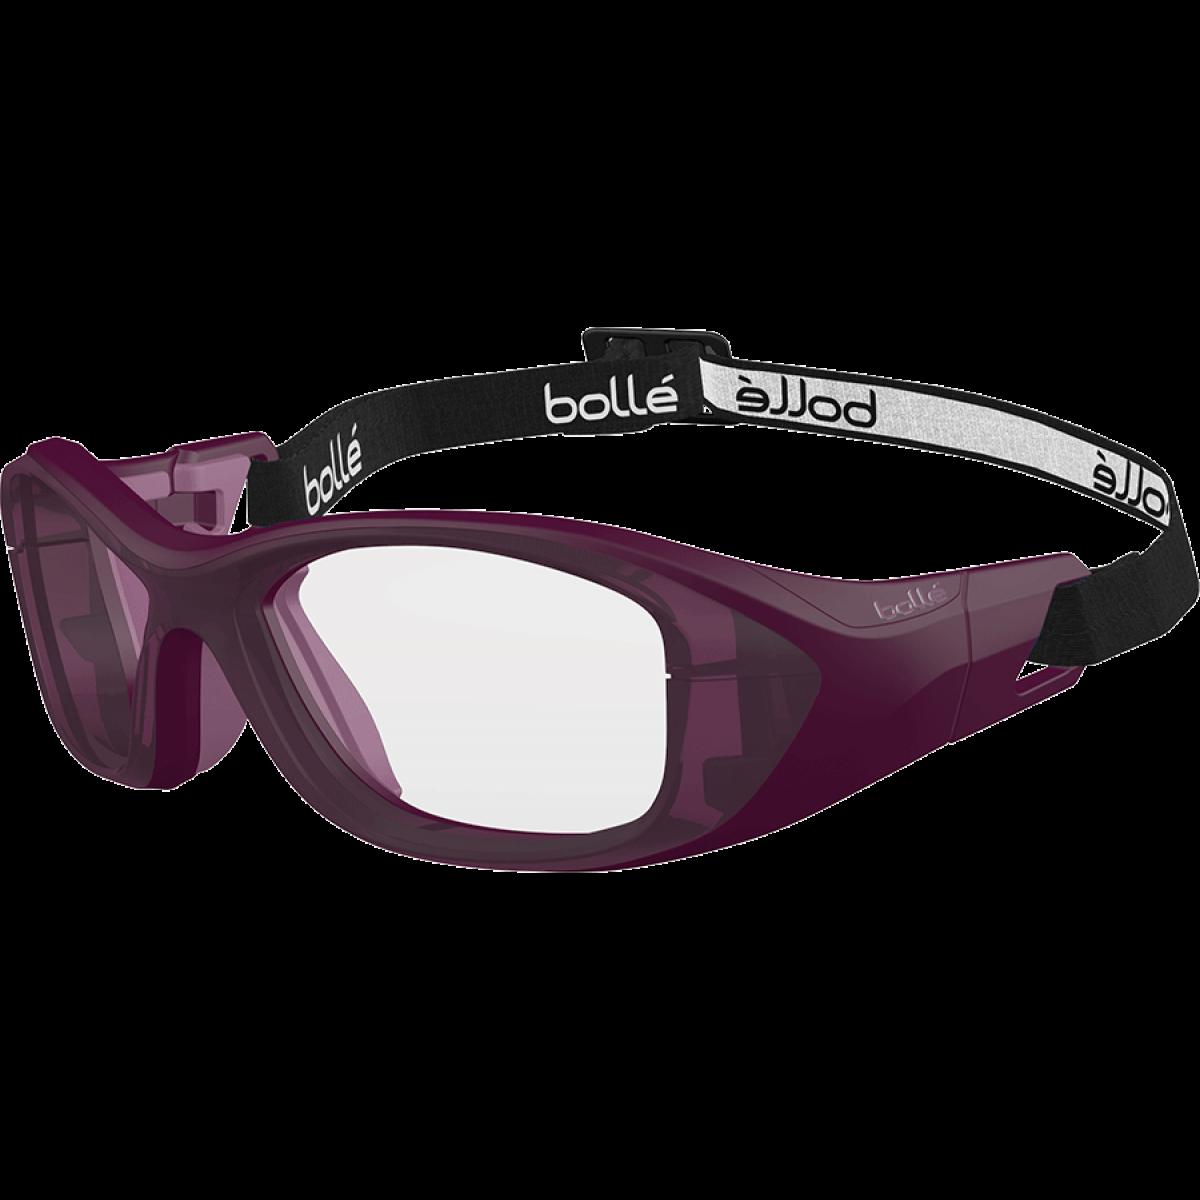 vector transparent Bolle Sport Swag Strap Prescription Safety Glasses